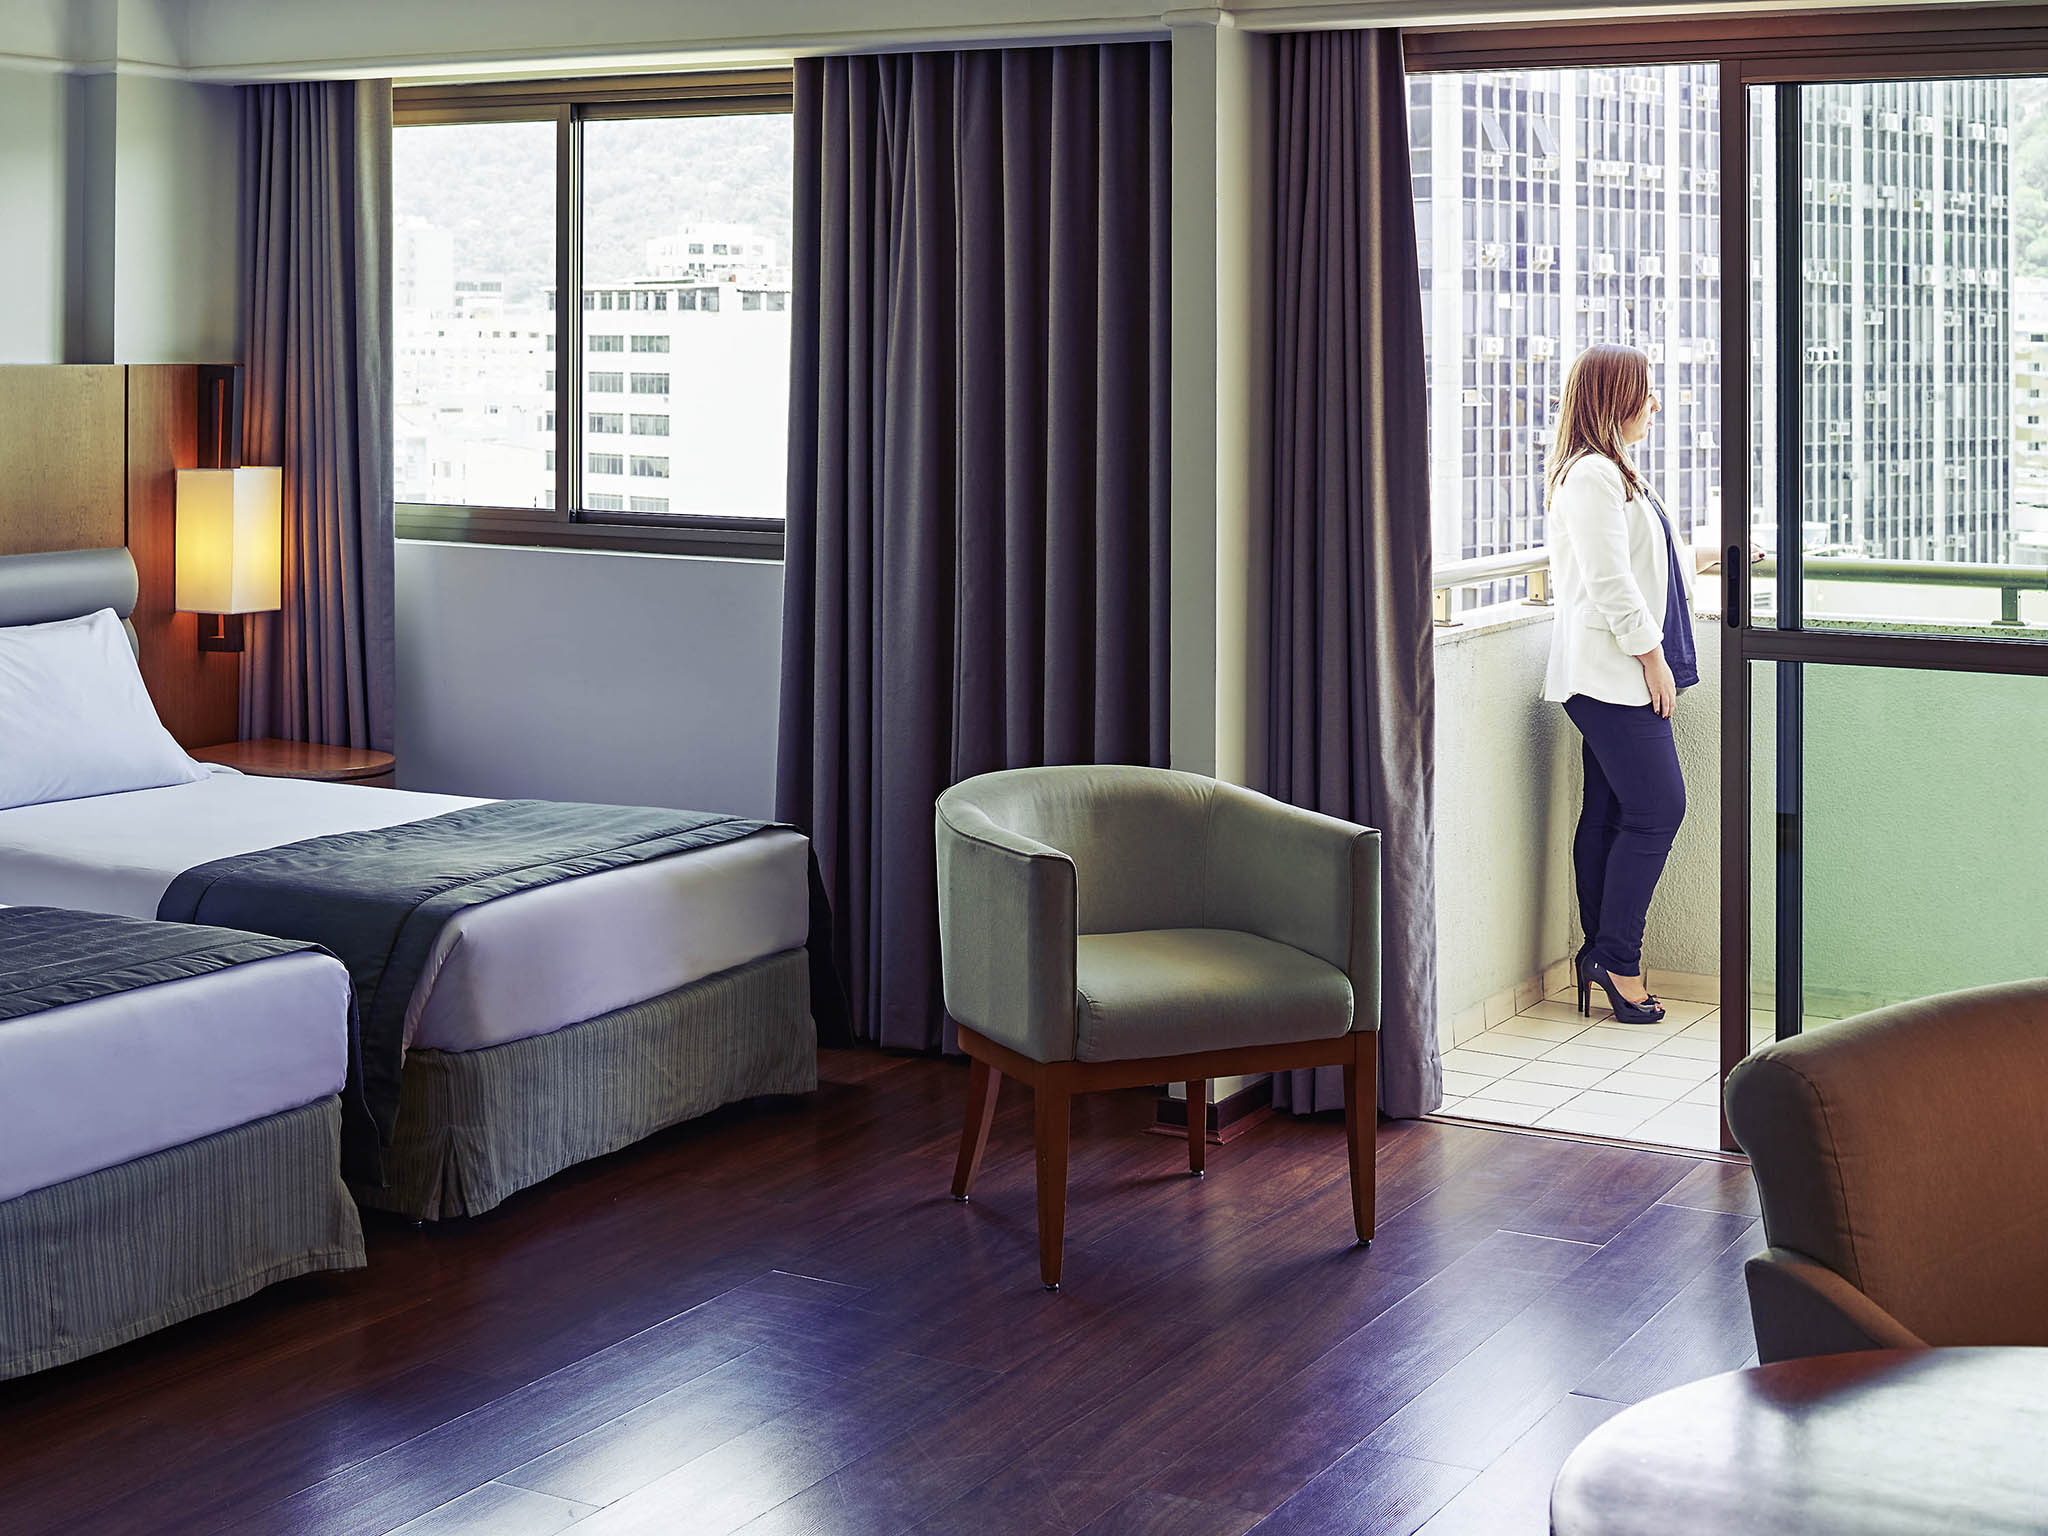 2a8473d517 ... Rooms - Mercure Rio de Janeiro Botafogo Mourisco Hotel ...